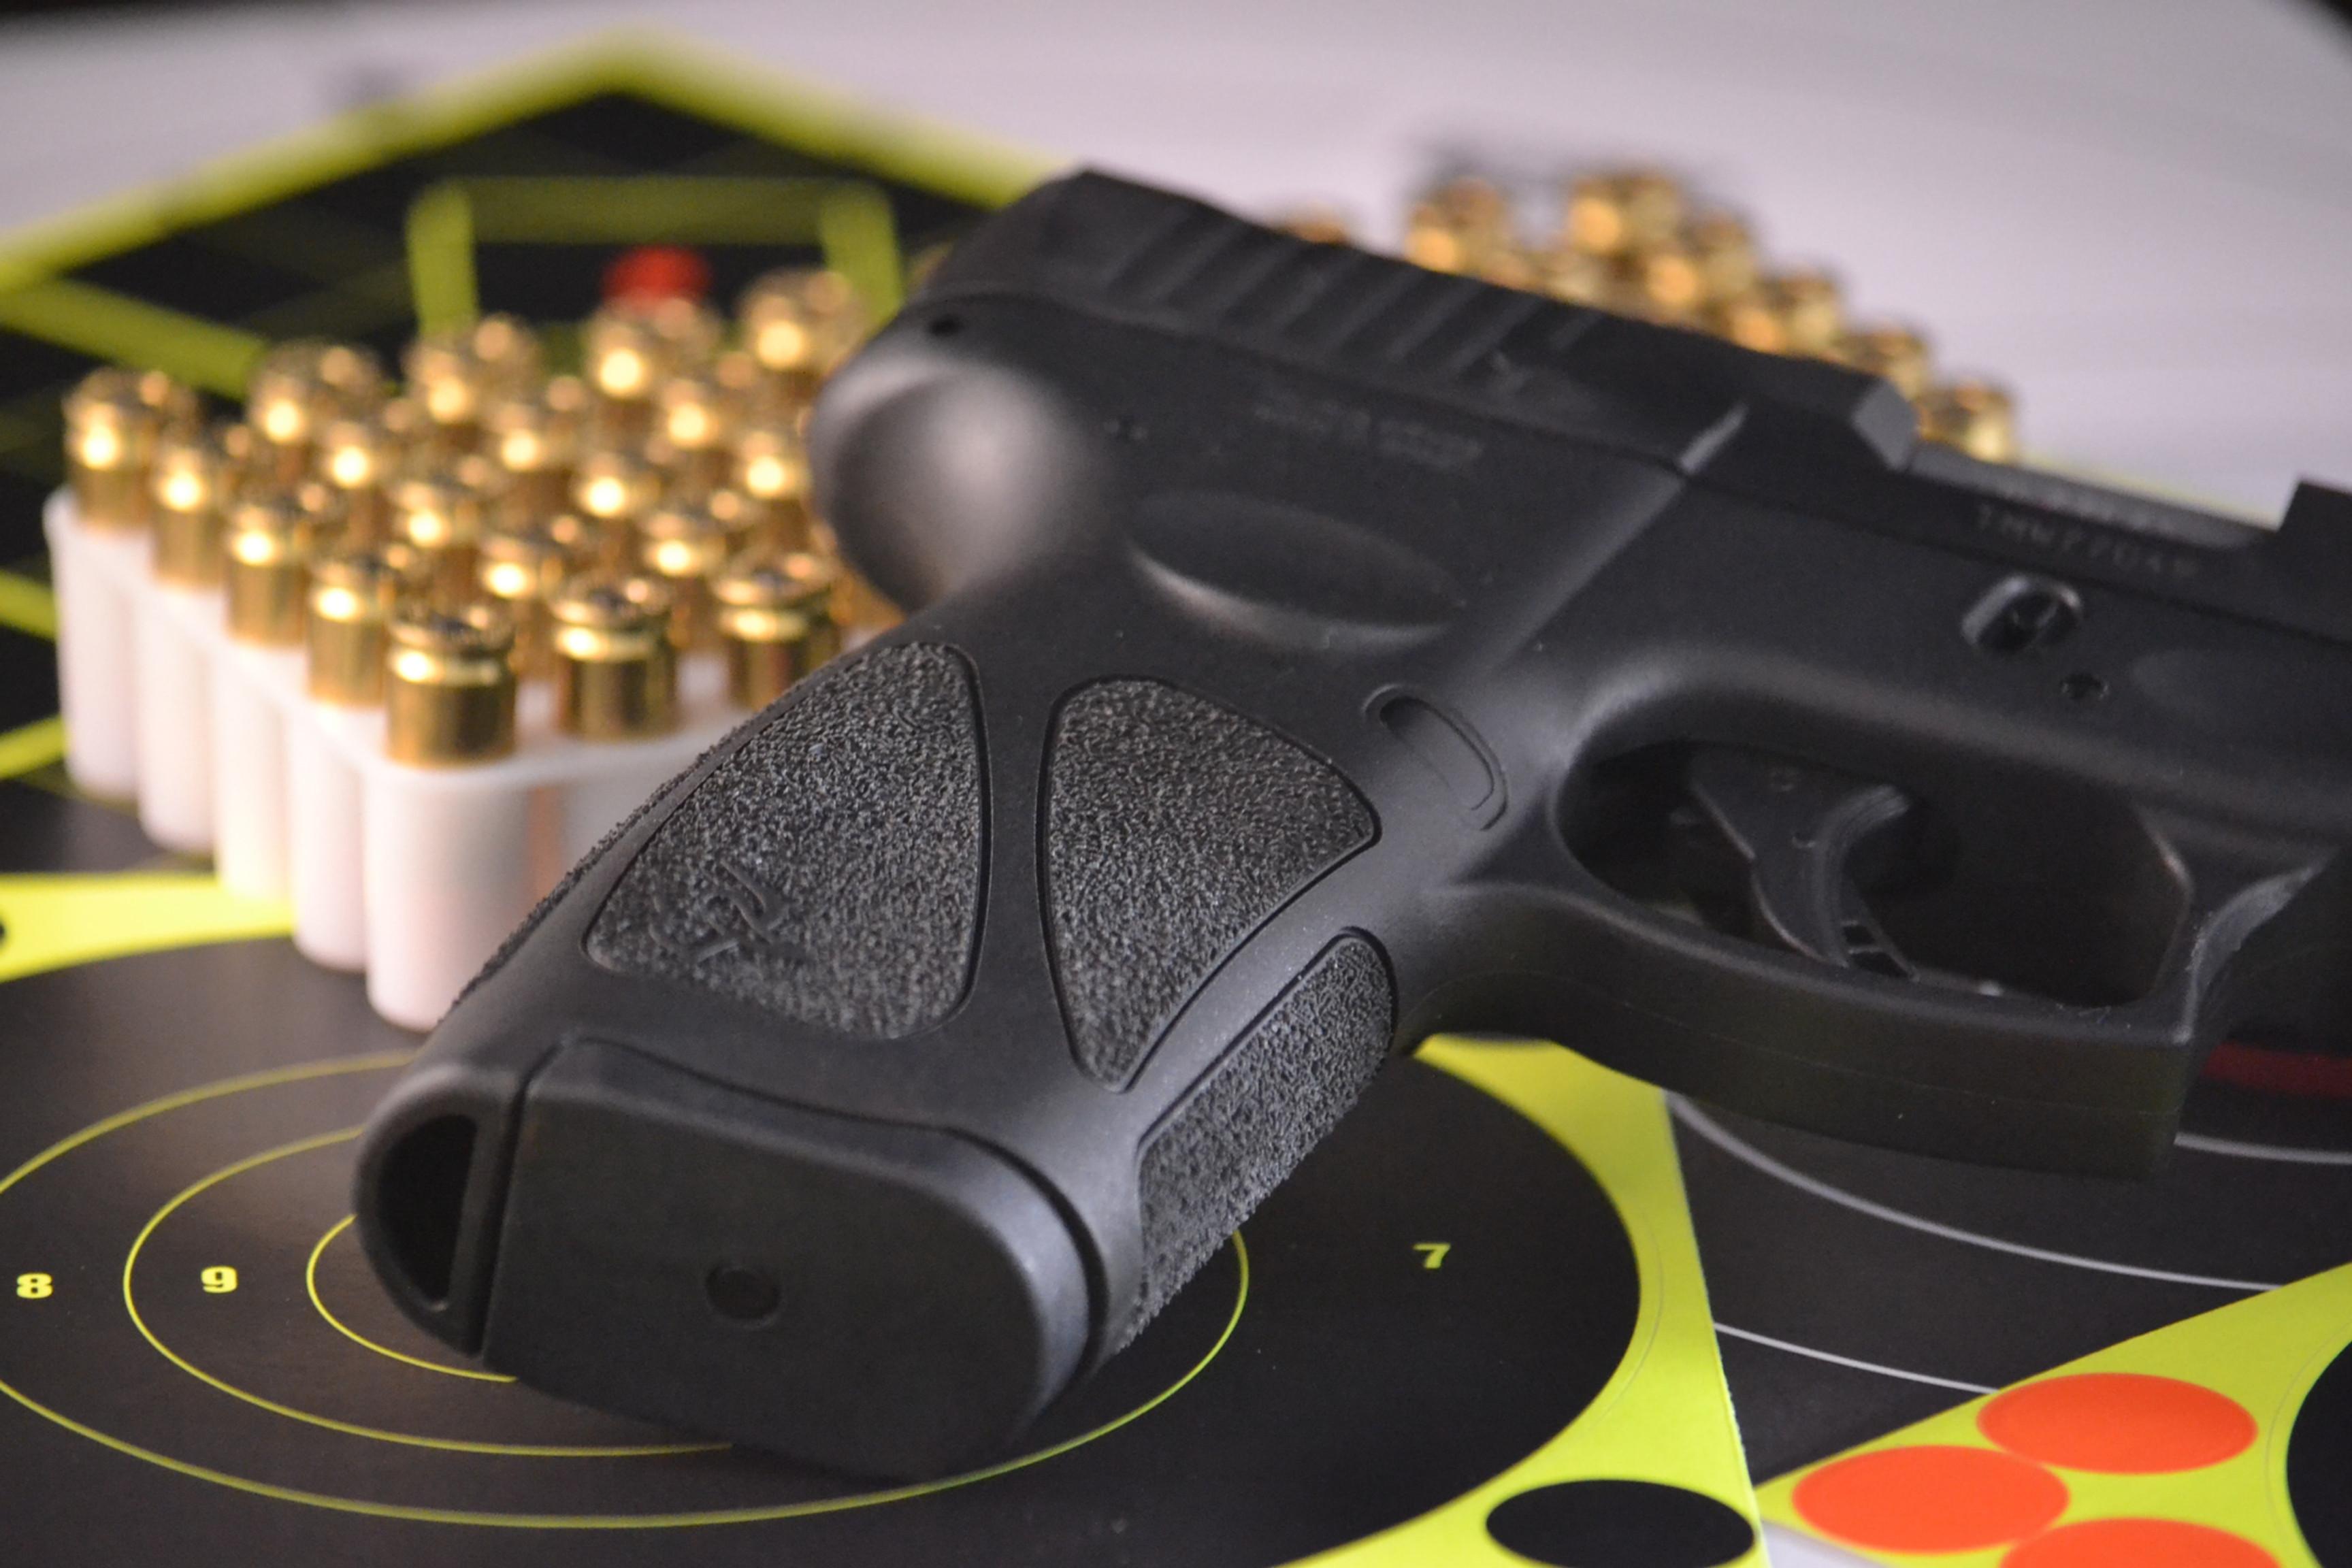 Handgun Marksmanship Training